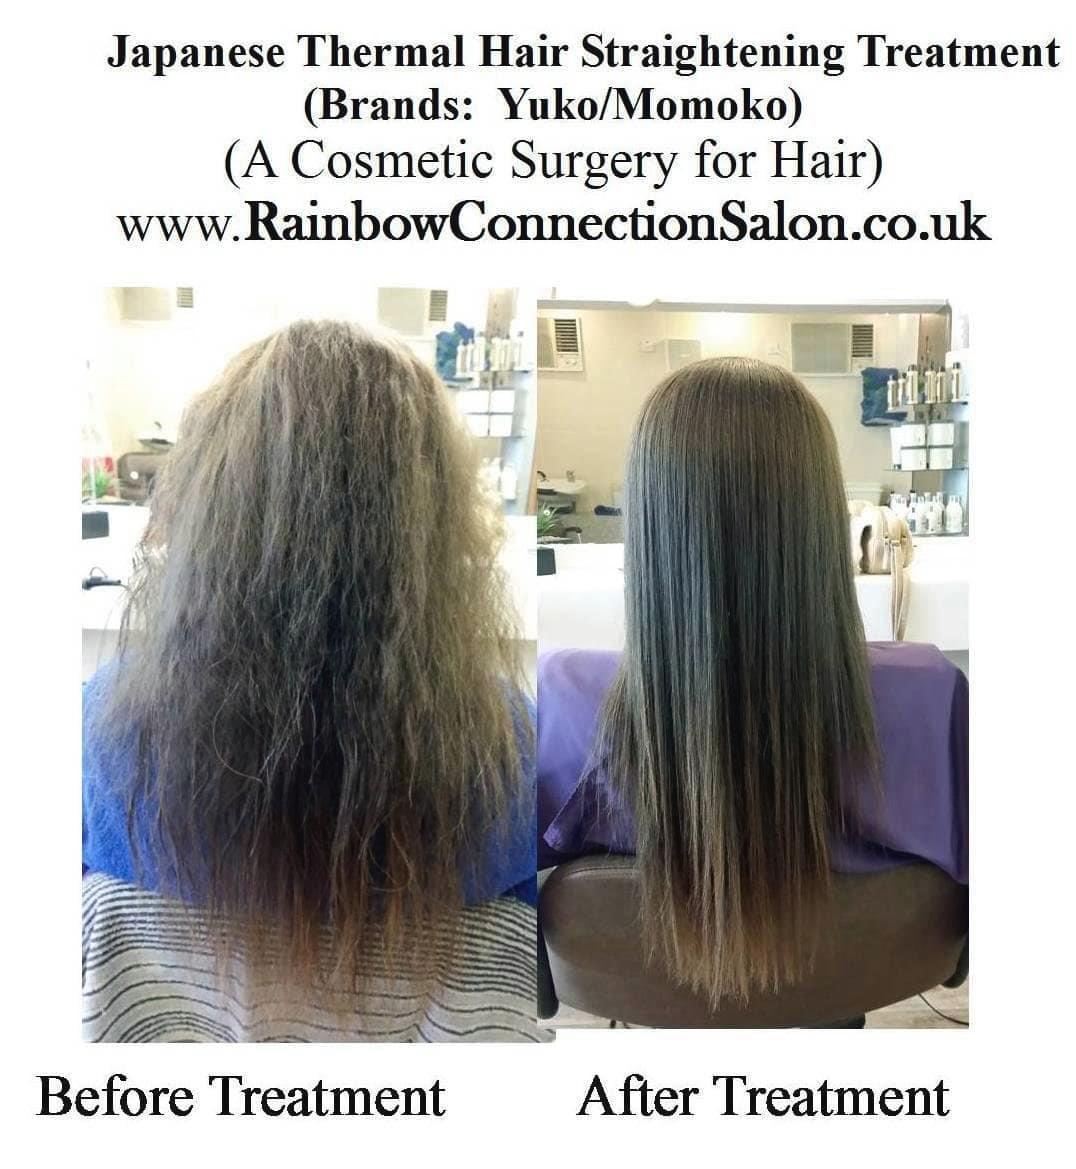 Rainbow Connection Professional Unisex Hair Salon